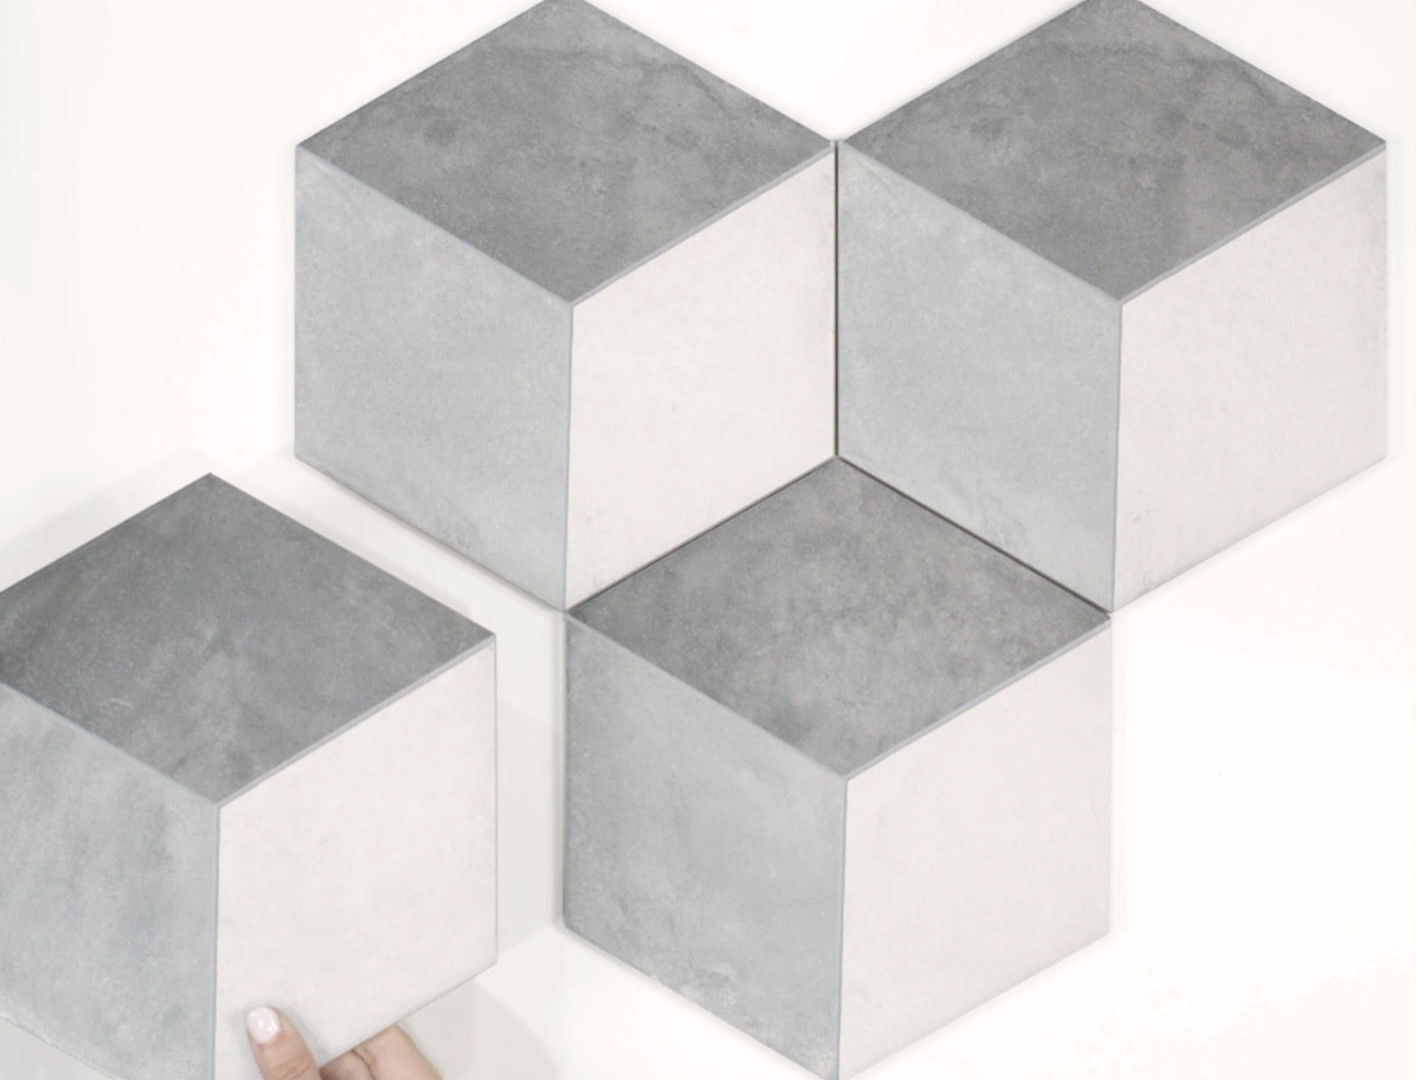 ATS Tiles & Bathrooms Product Video